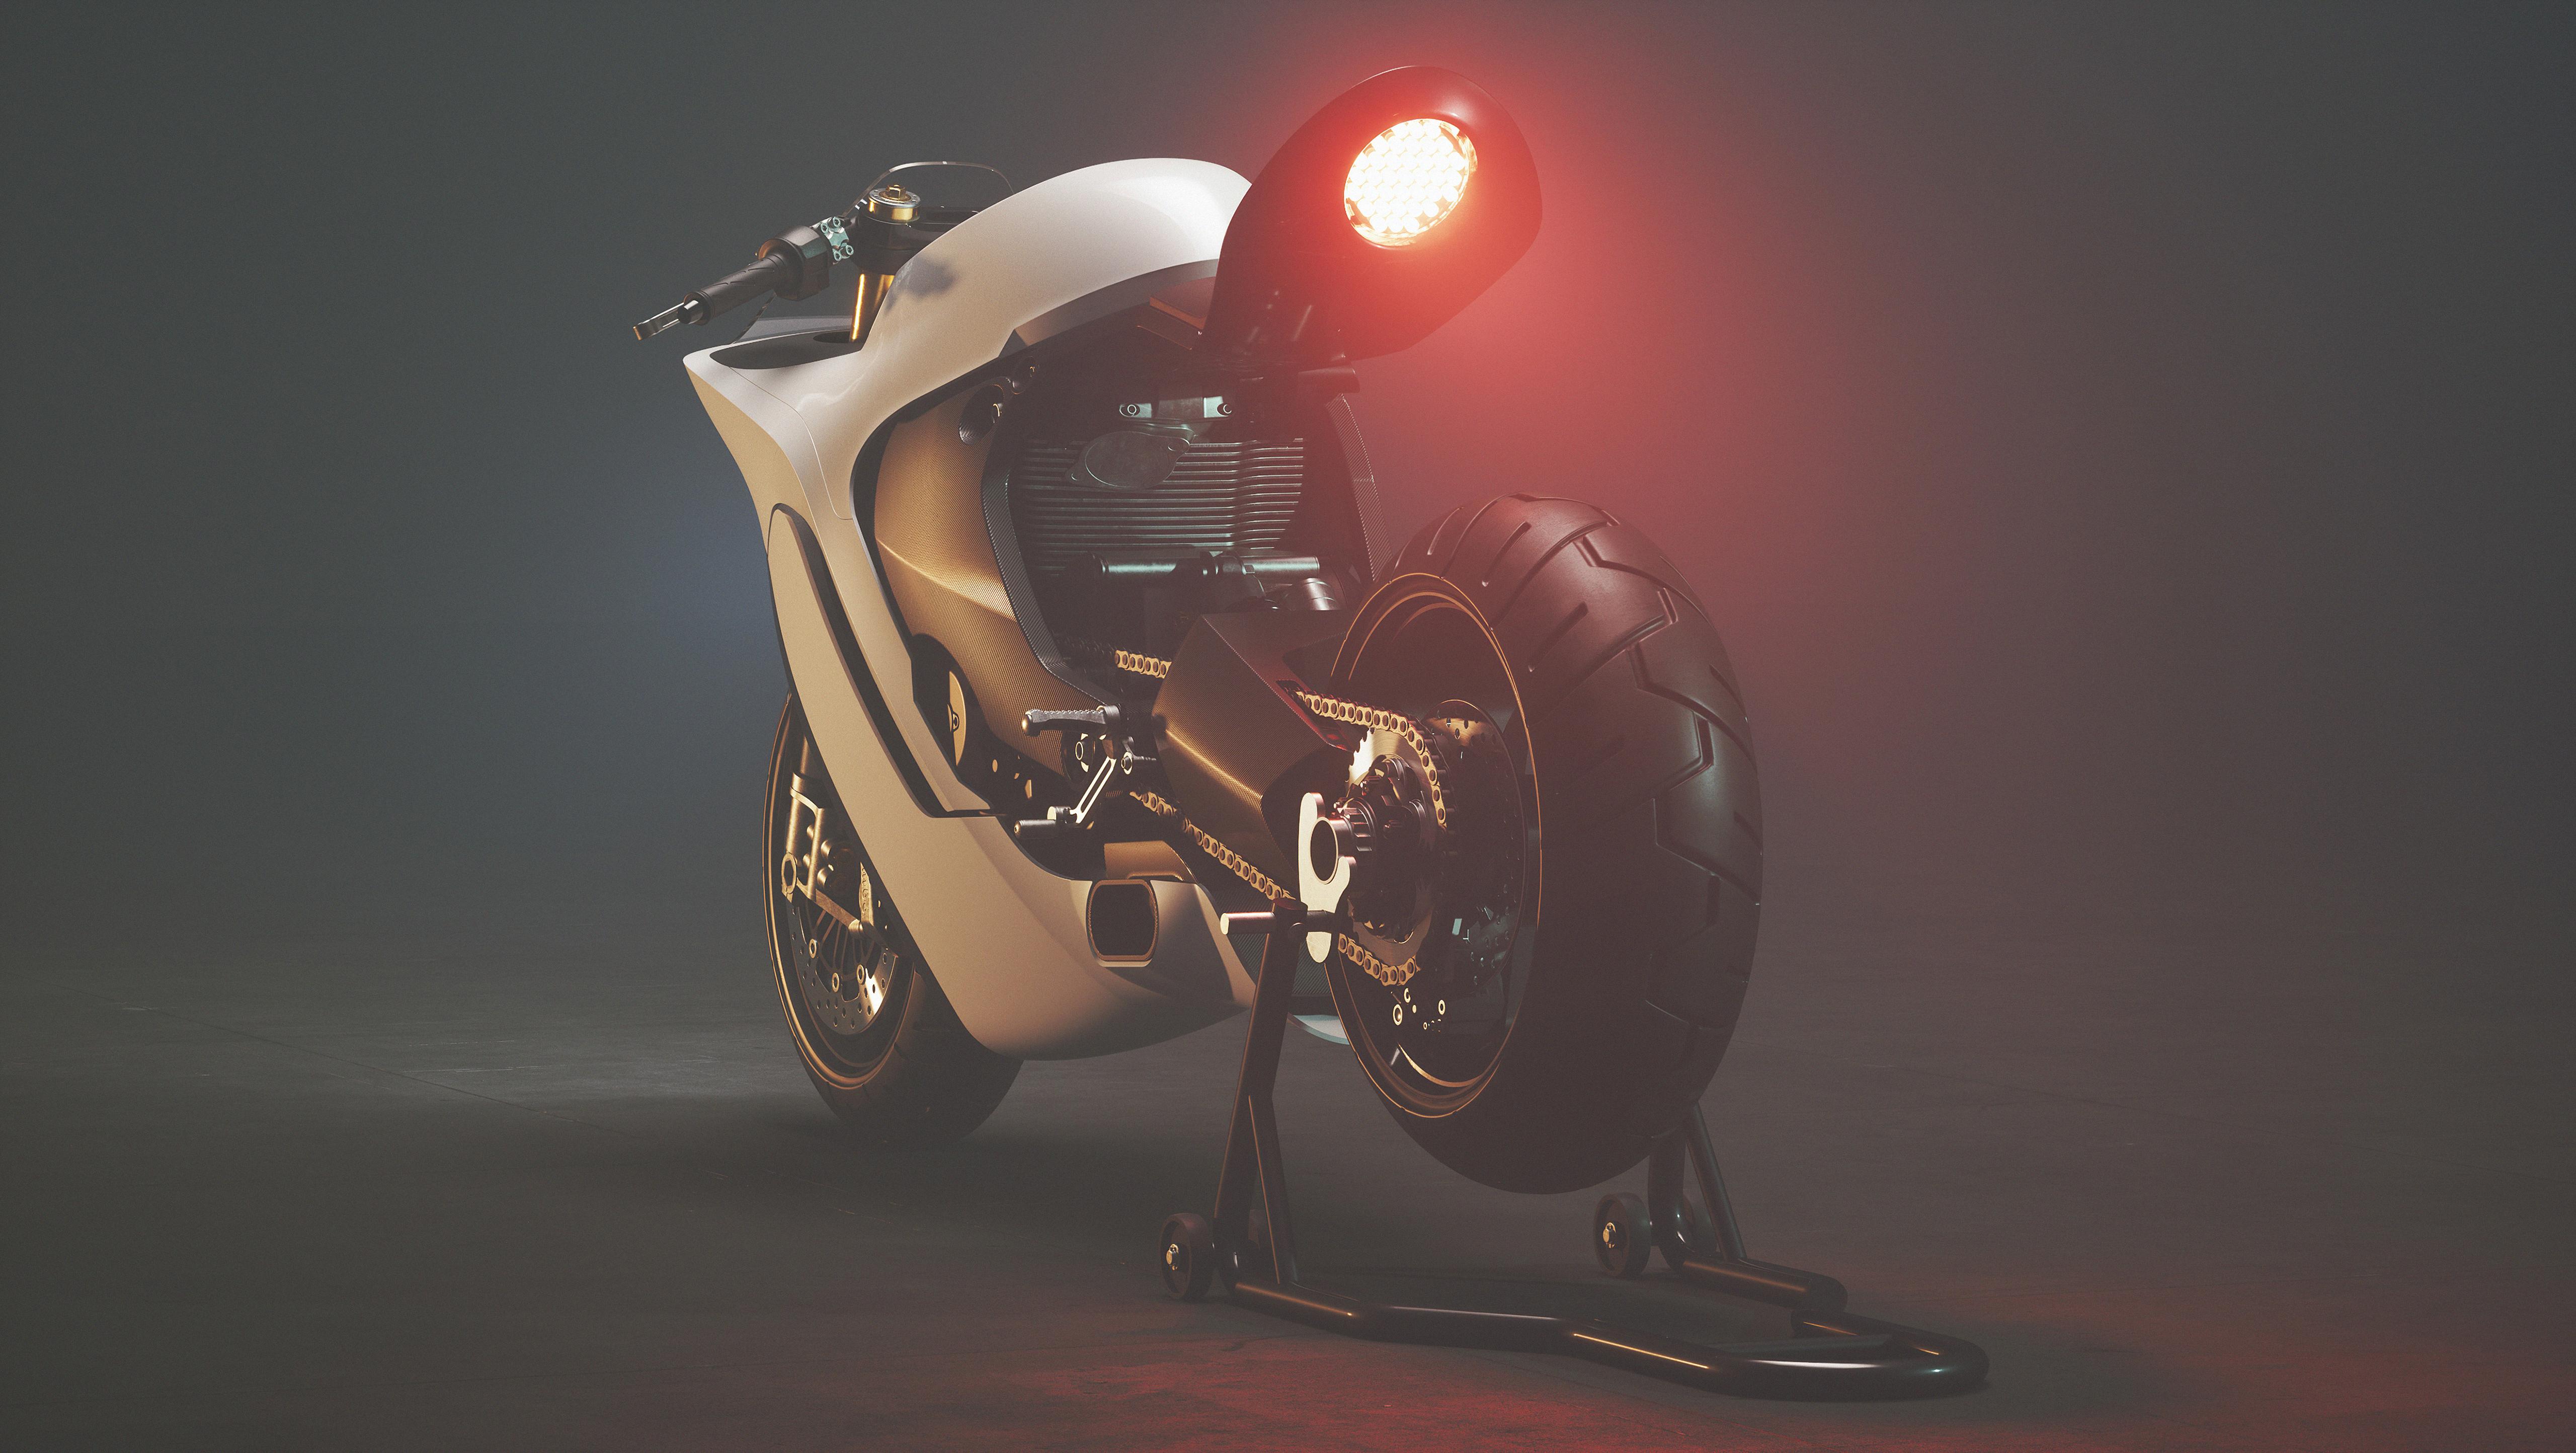 moto racer f strom cgi 4k 1616876693 1 - Moto Racer F Strom Cgi 4k - Moto Racer F Strom Cgi 4k wallpapers